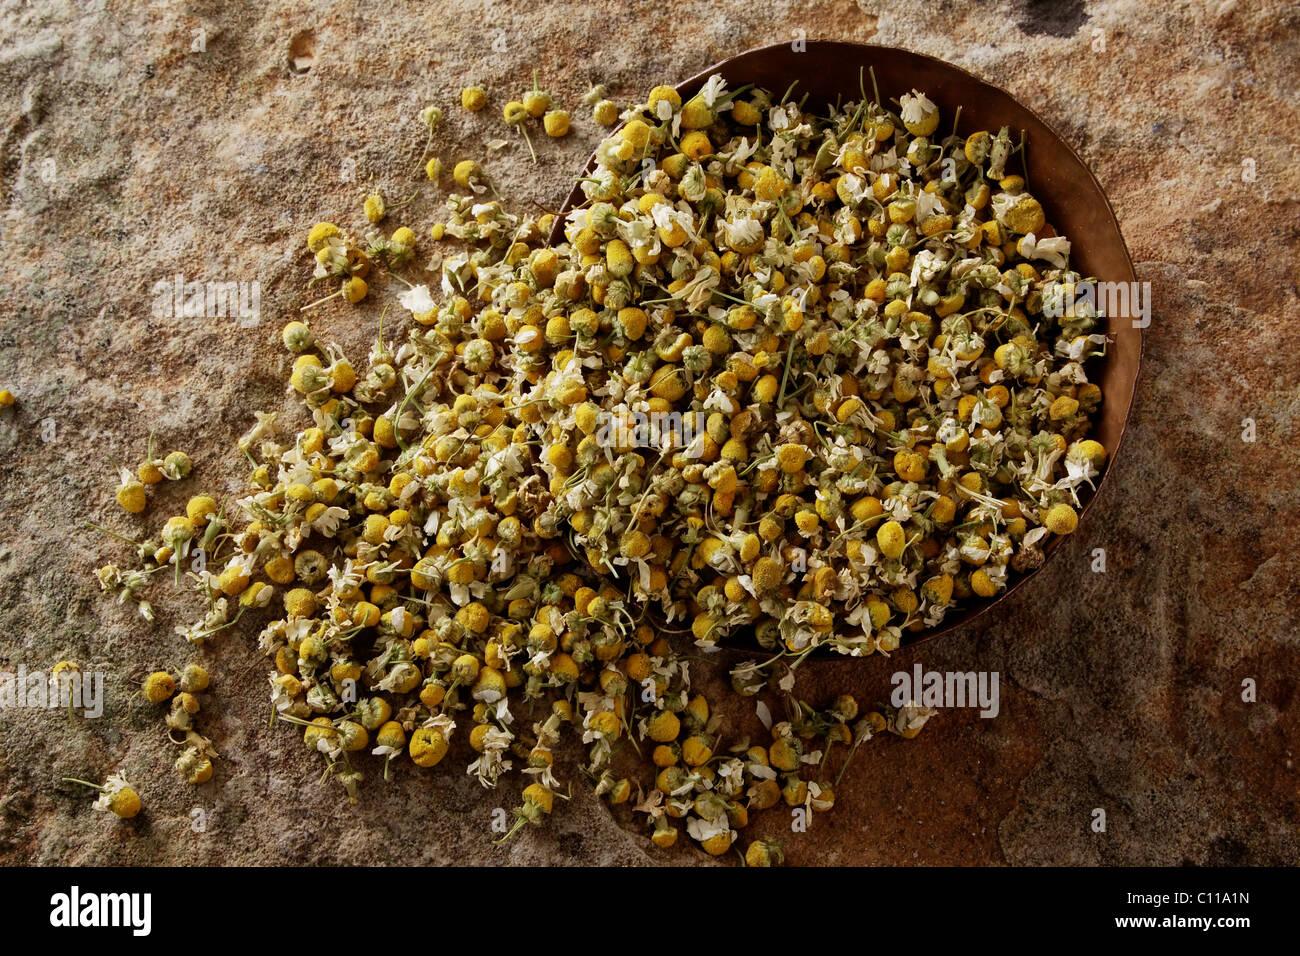 German Chamomile (Matricaria chamomilla), blossoms, in a copper bowl on a stone surface - Stock Image